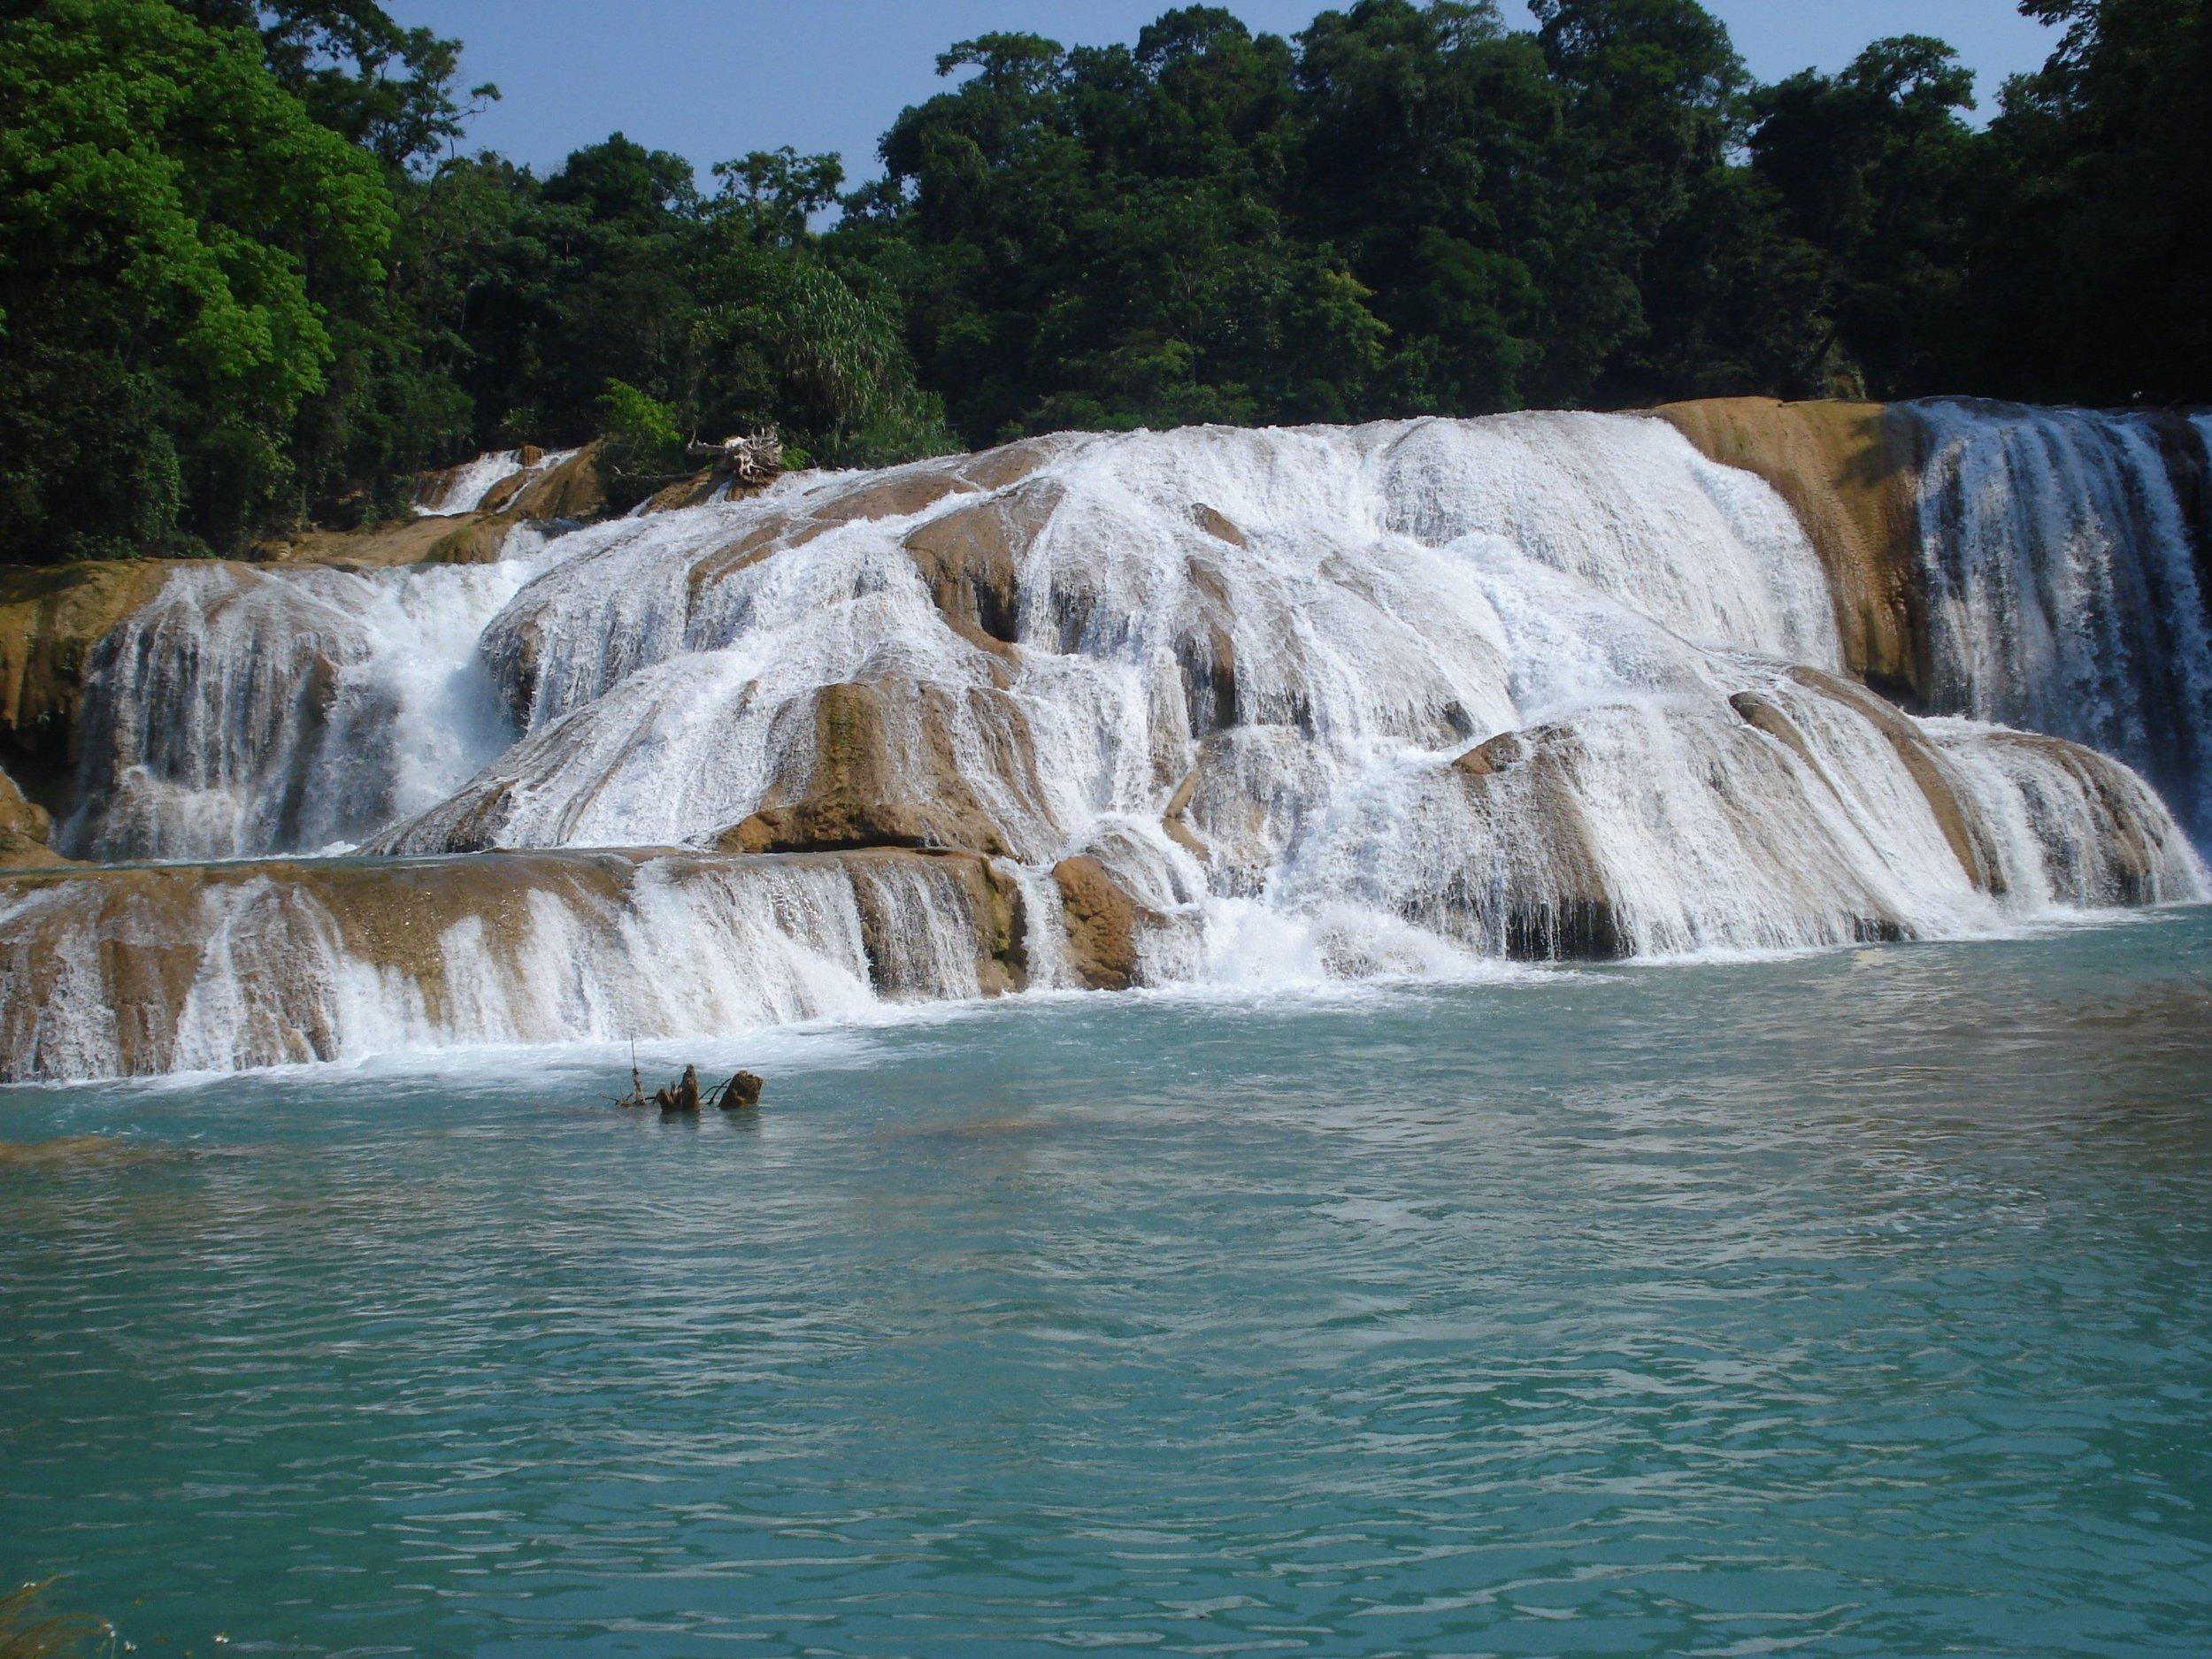 depositphotos_46139717-stock-photo-agua-azul-waterfalls-chiapas-mexico.jpg